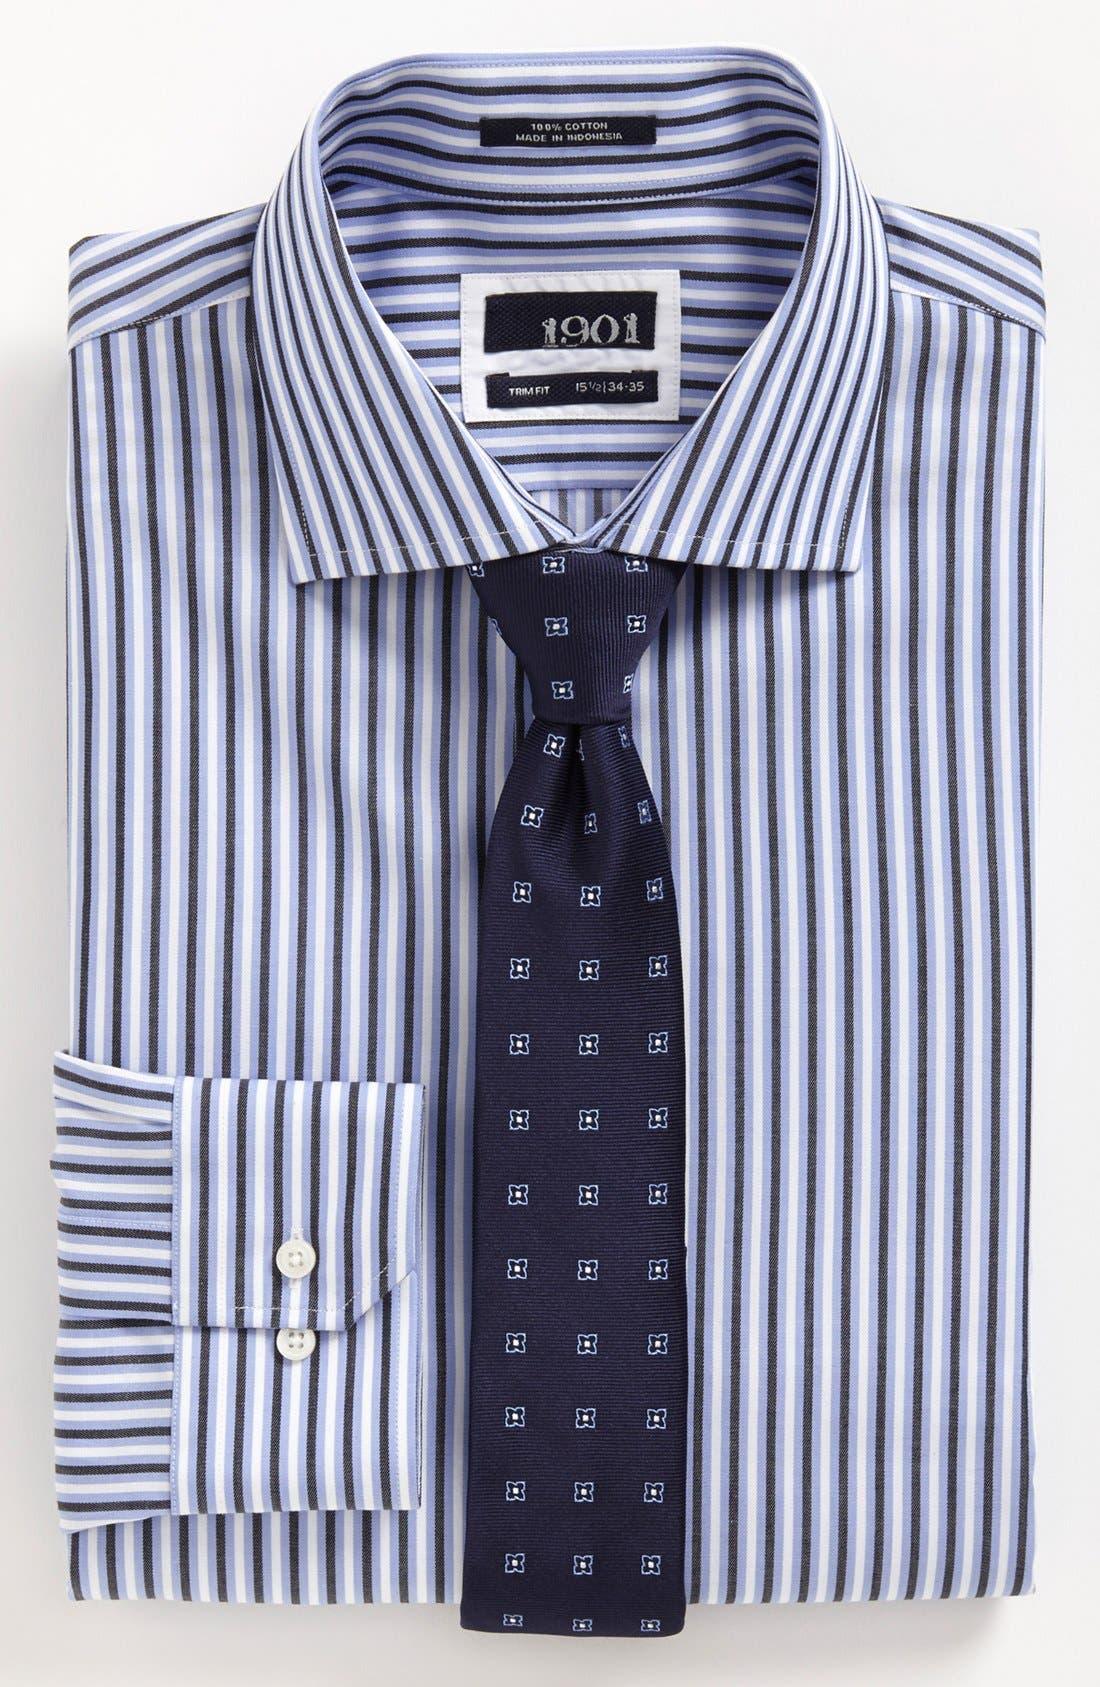 Alternate Image 1 Selected - 1901 Dress Shirt & Tie